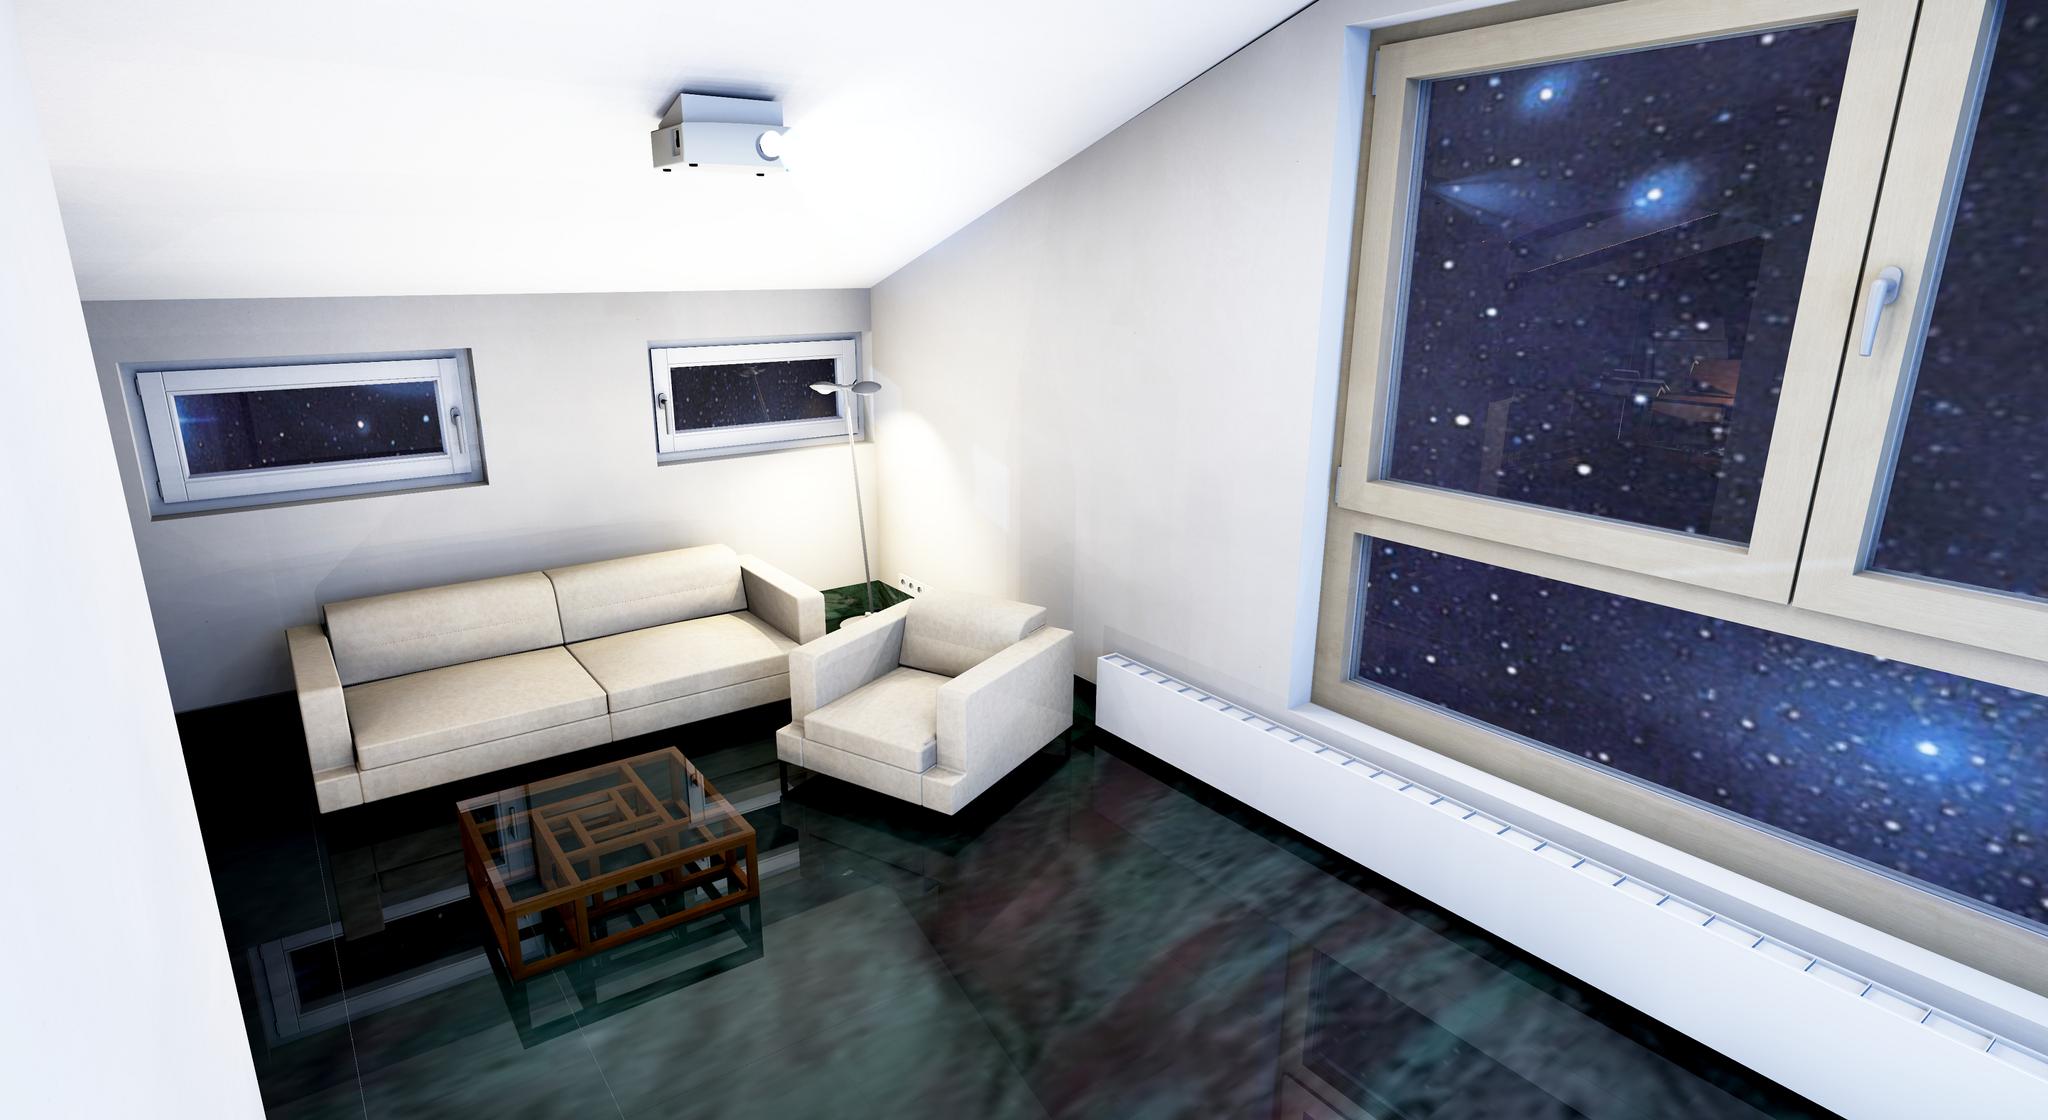 Beamer Raum Sofa und Nachthimmel